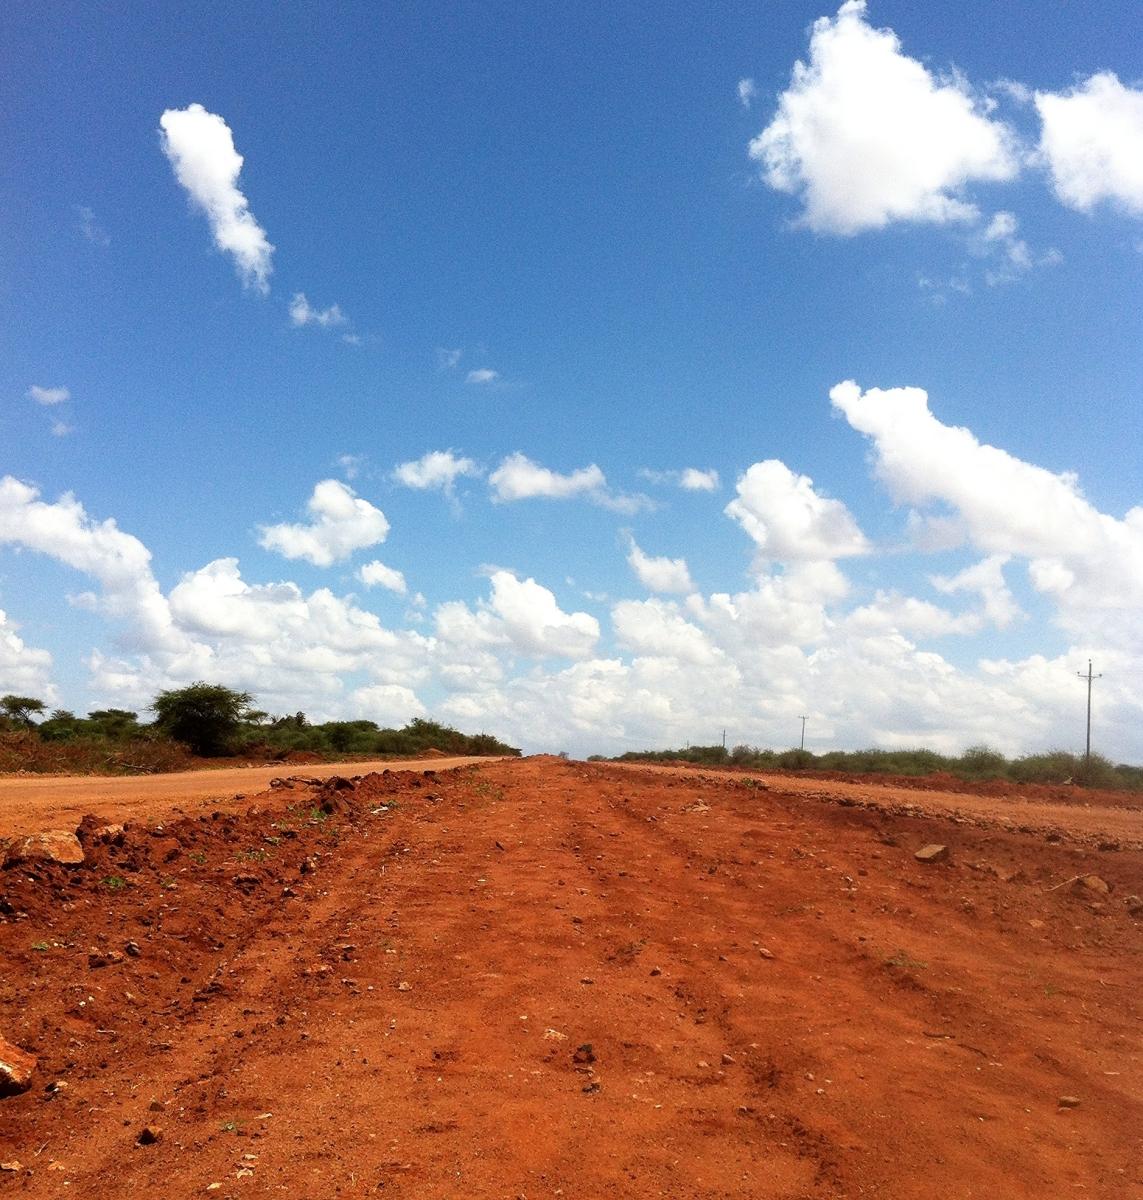 Tsavo, Kenia, Kenya, Reisen, Travel, Nature